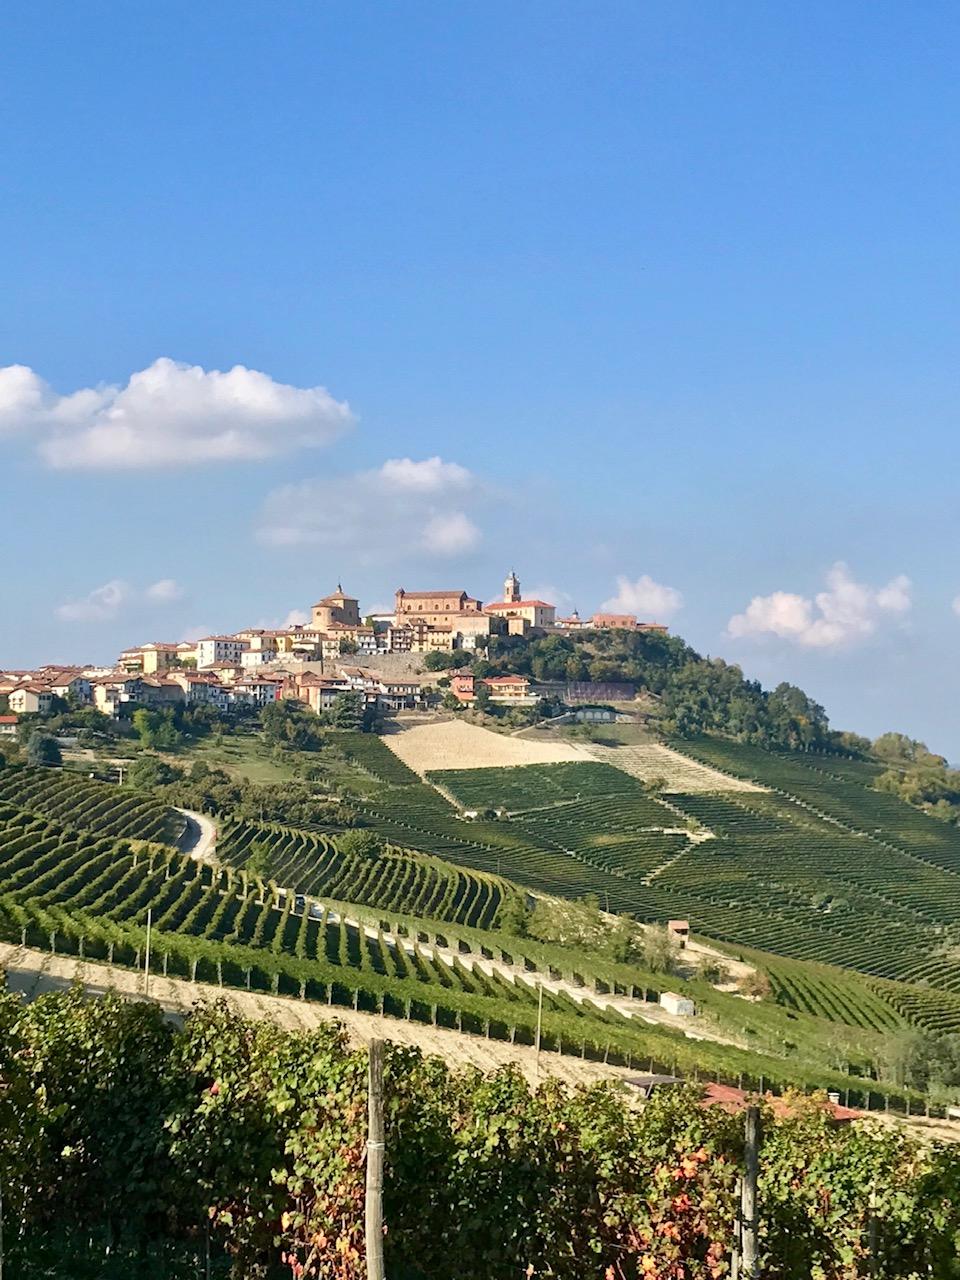 Visiting Piemonte